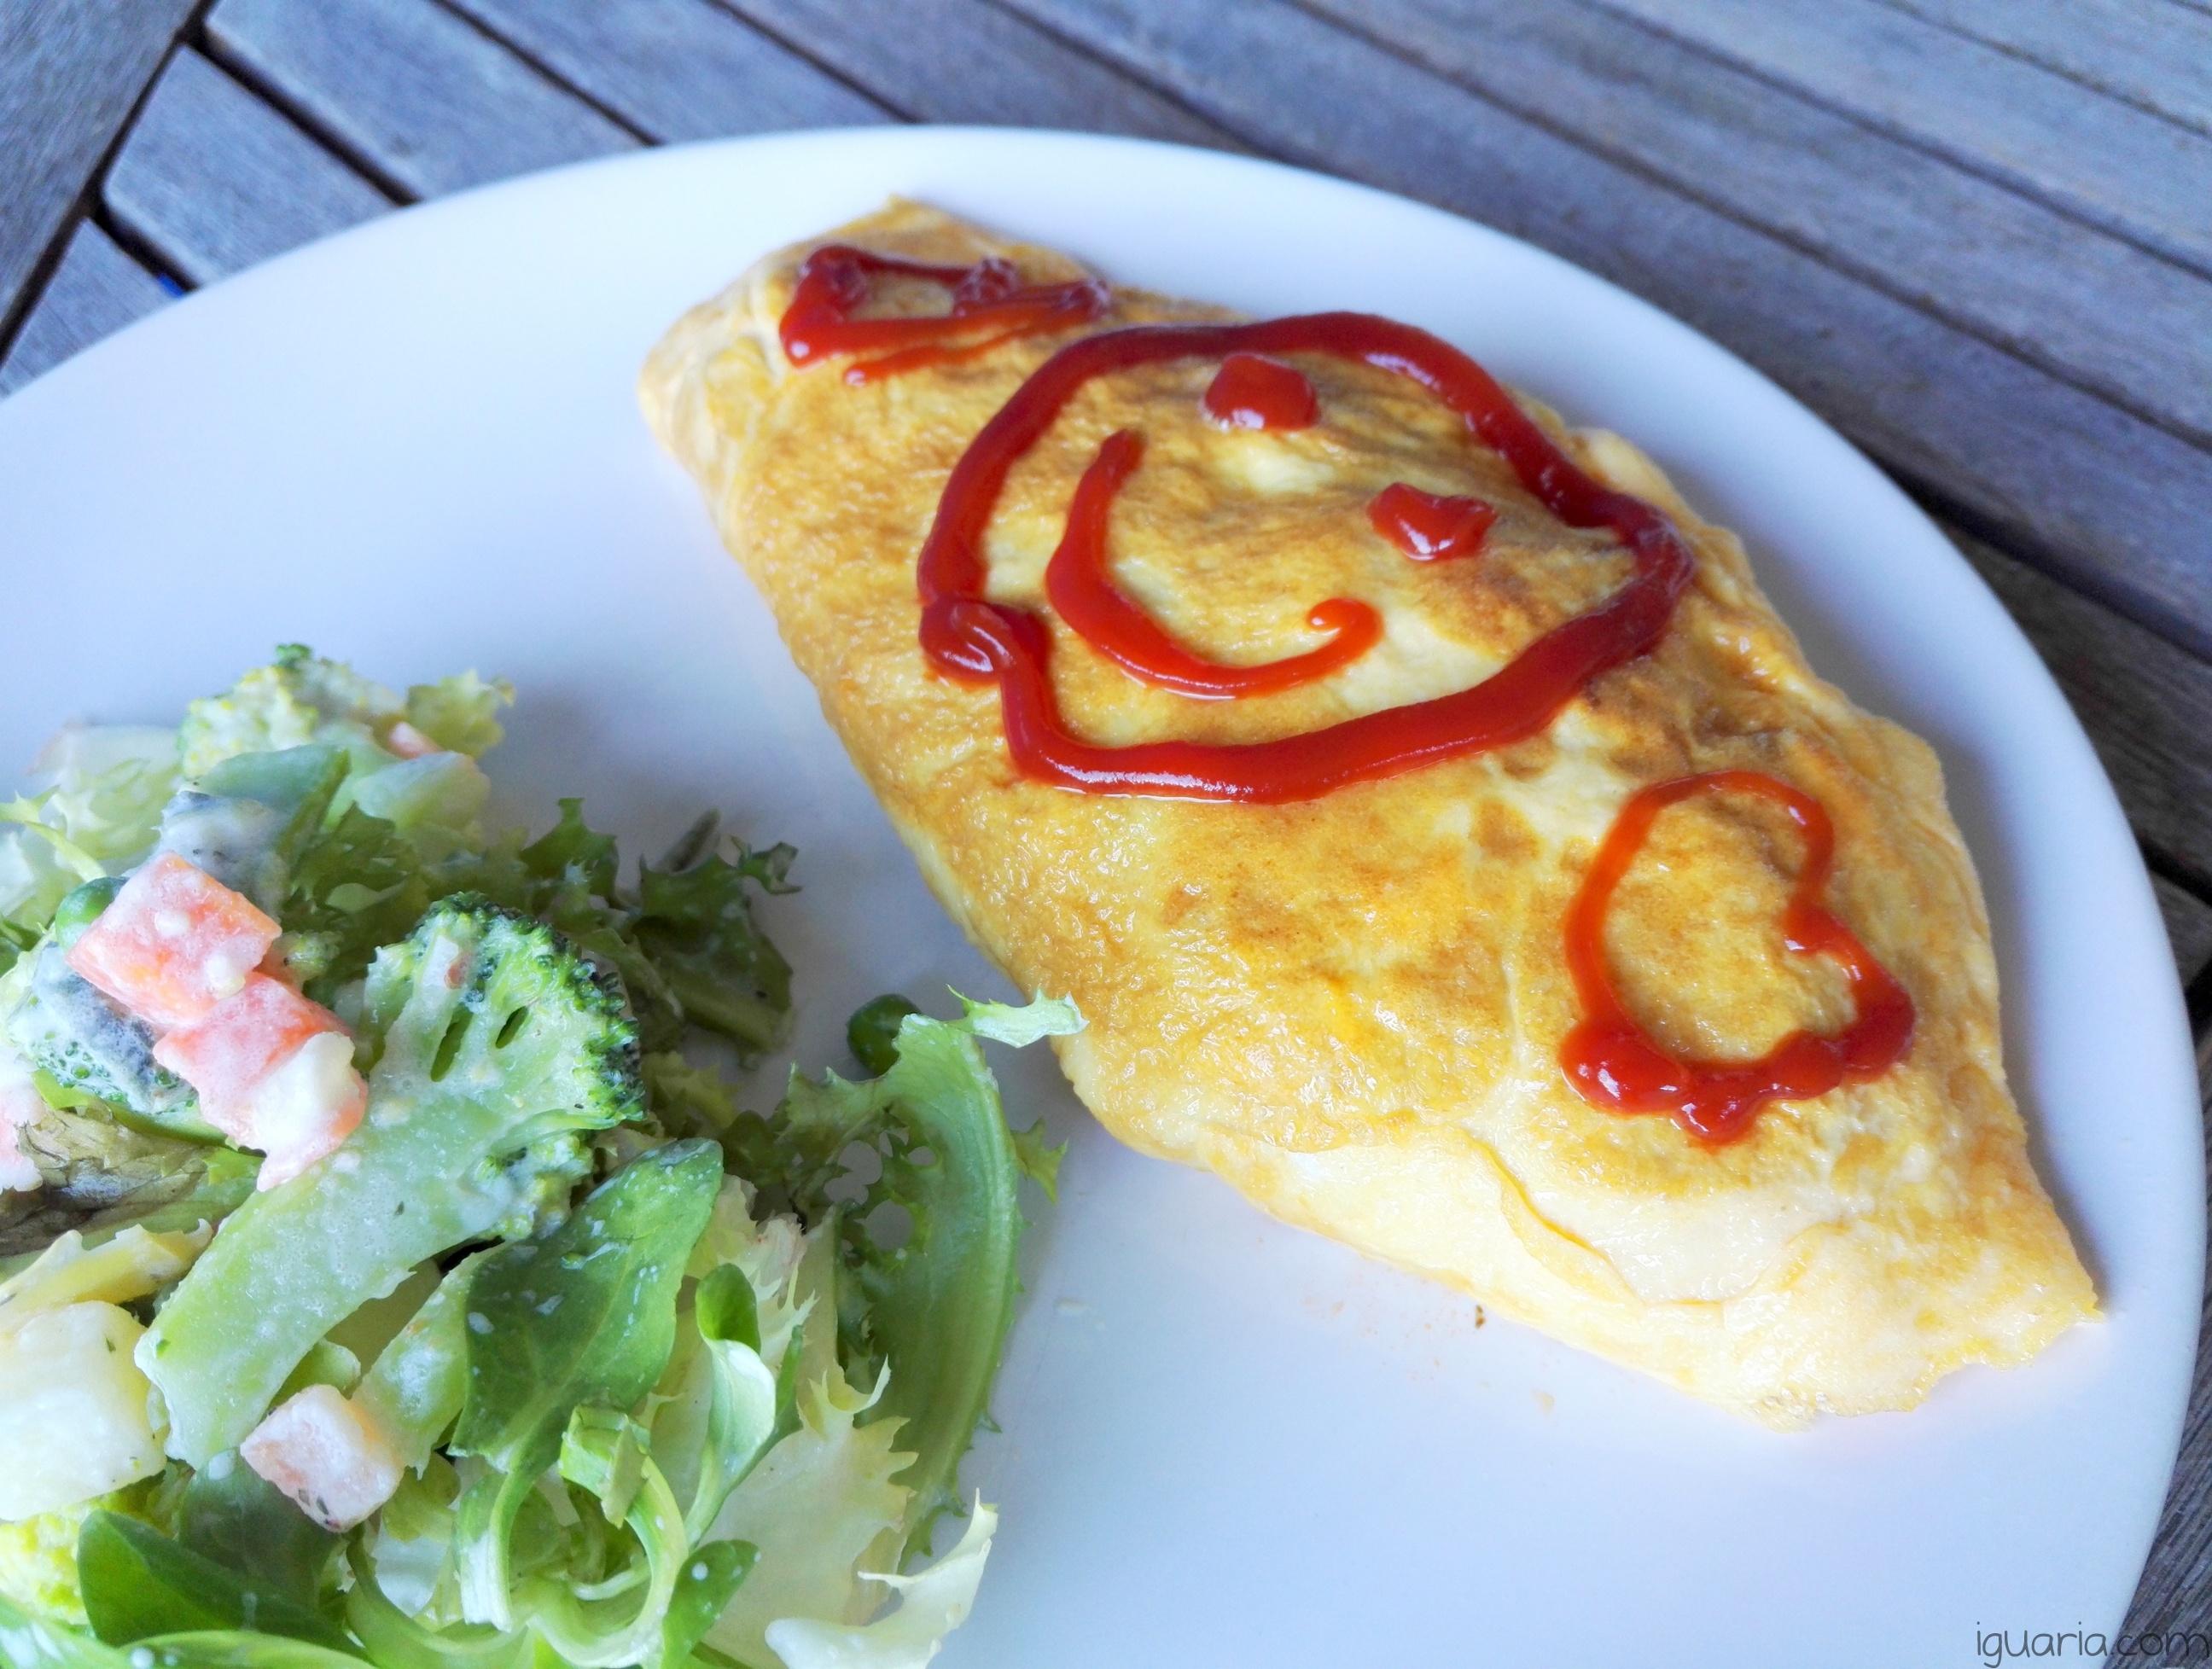 iguaria-omelete-japonesa-recheada-de-arroz